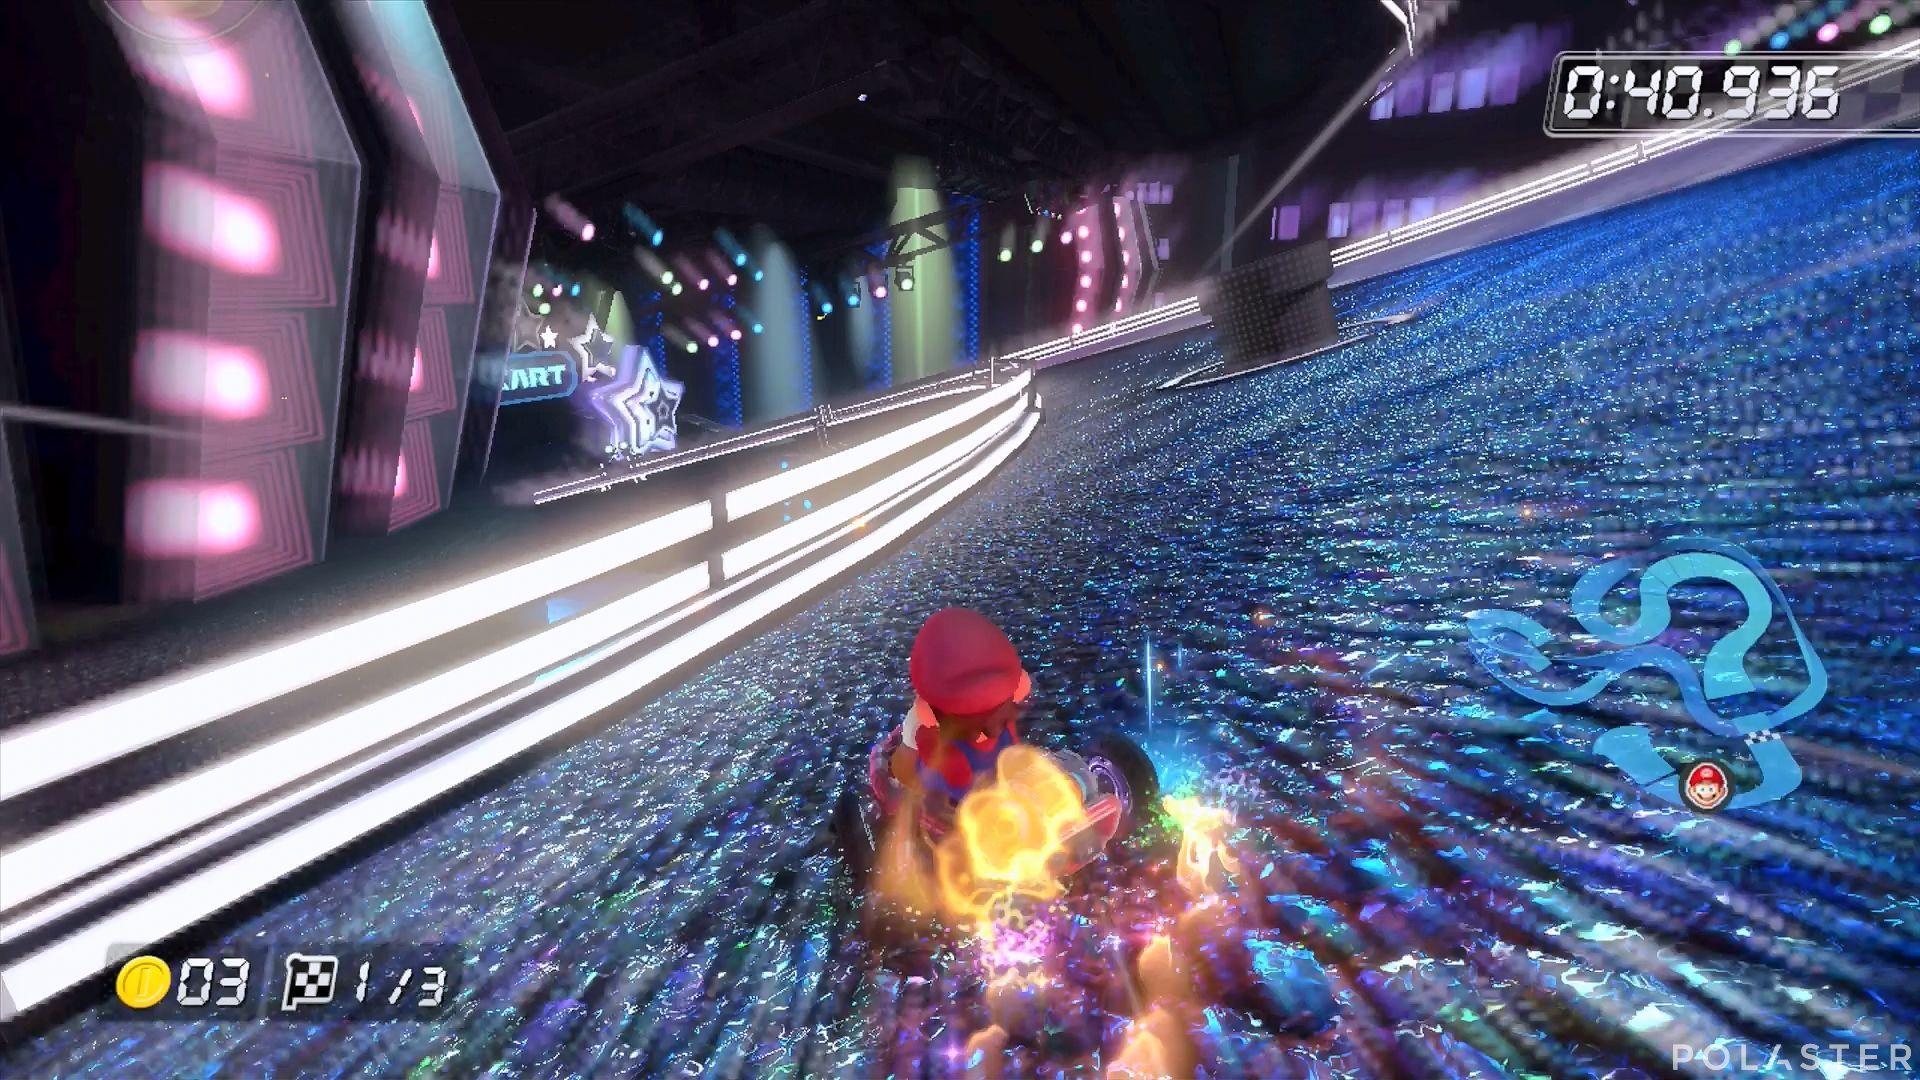 Mario Kart 8 - Discoestadio